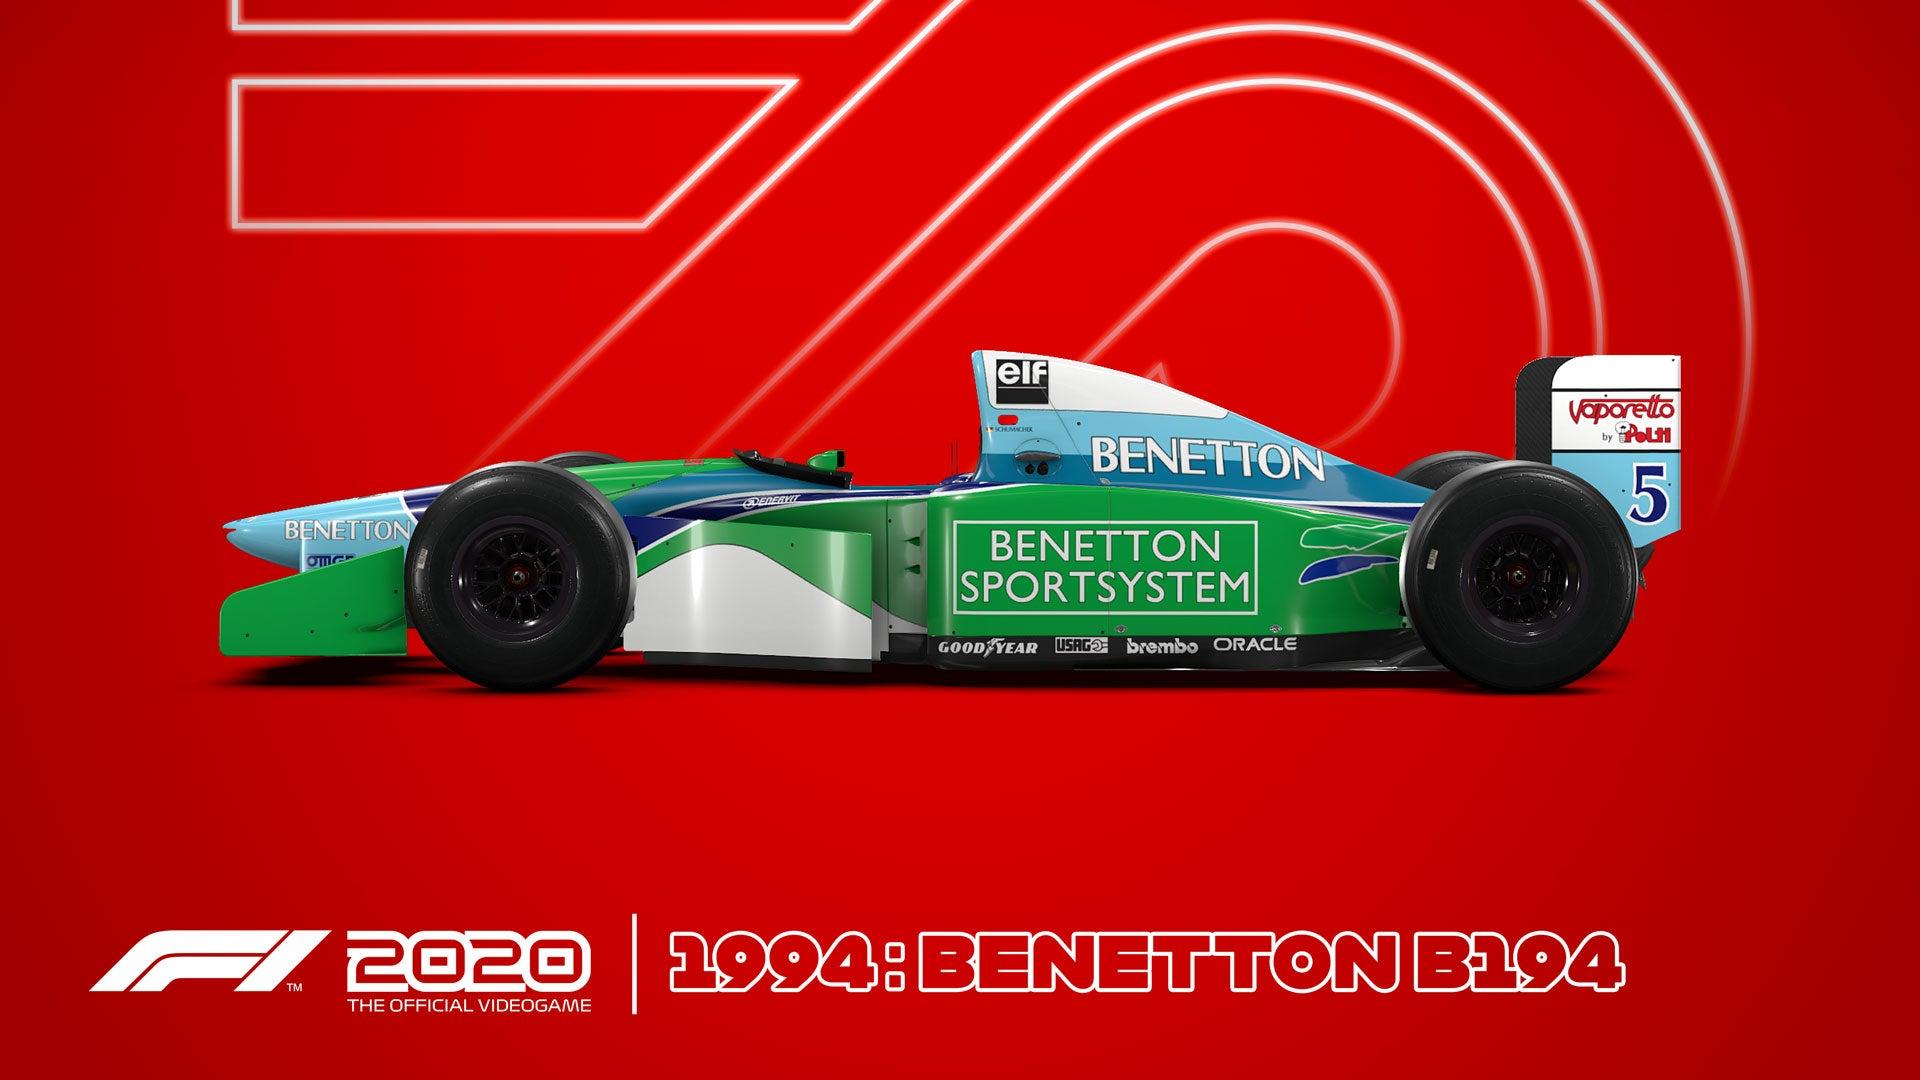 F12020_Benetton_94_16x9.jpg